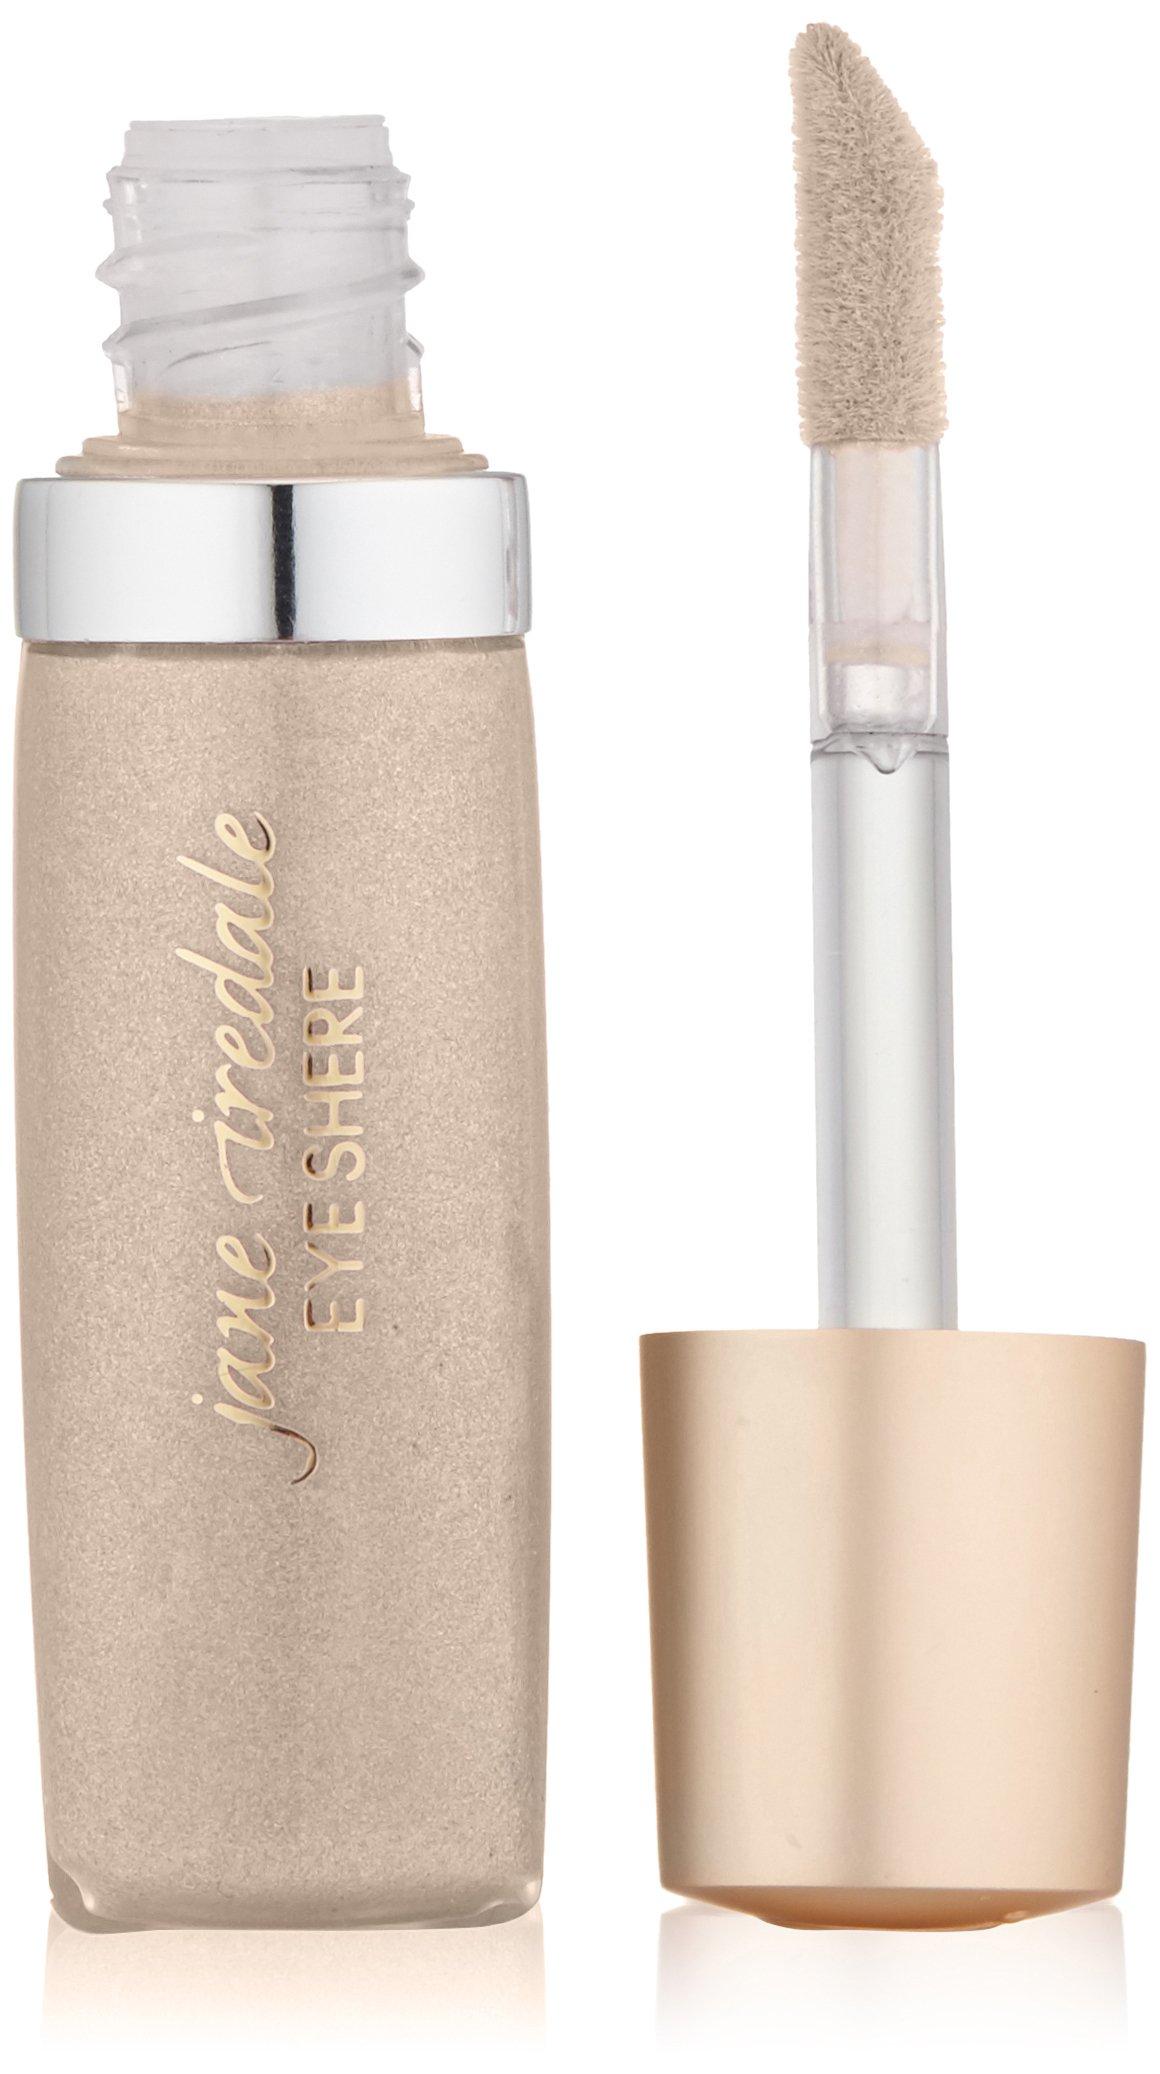 jane iredale Eye Shere Liquid Eye Shadow, Champagne Silk, 0.13 oz.